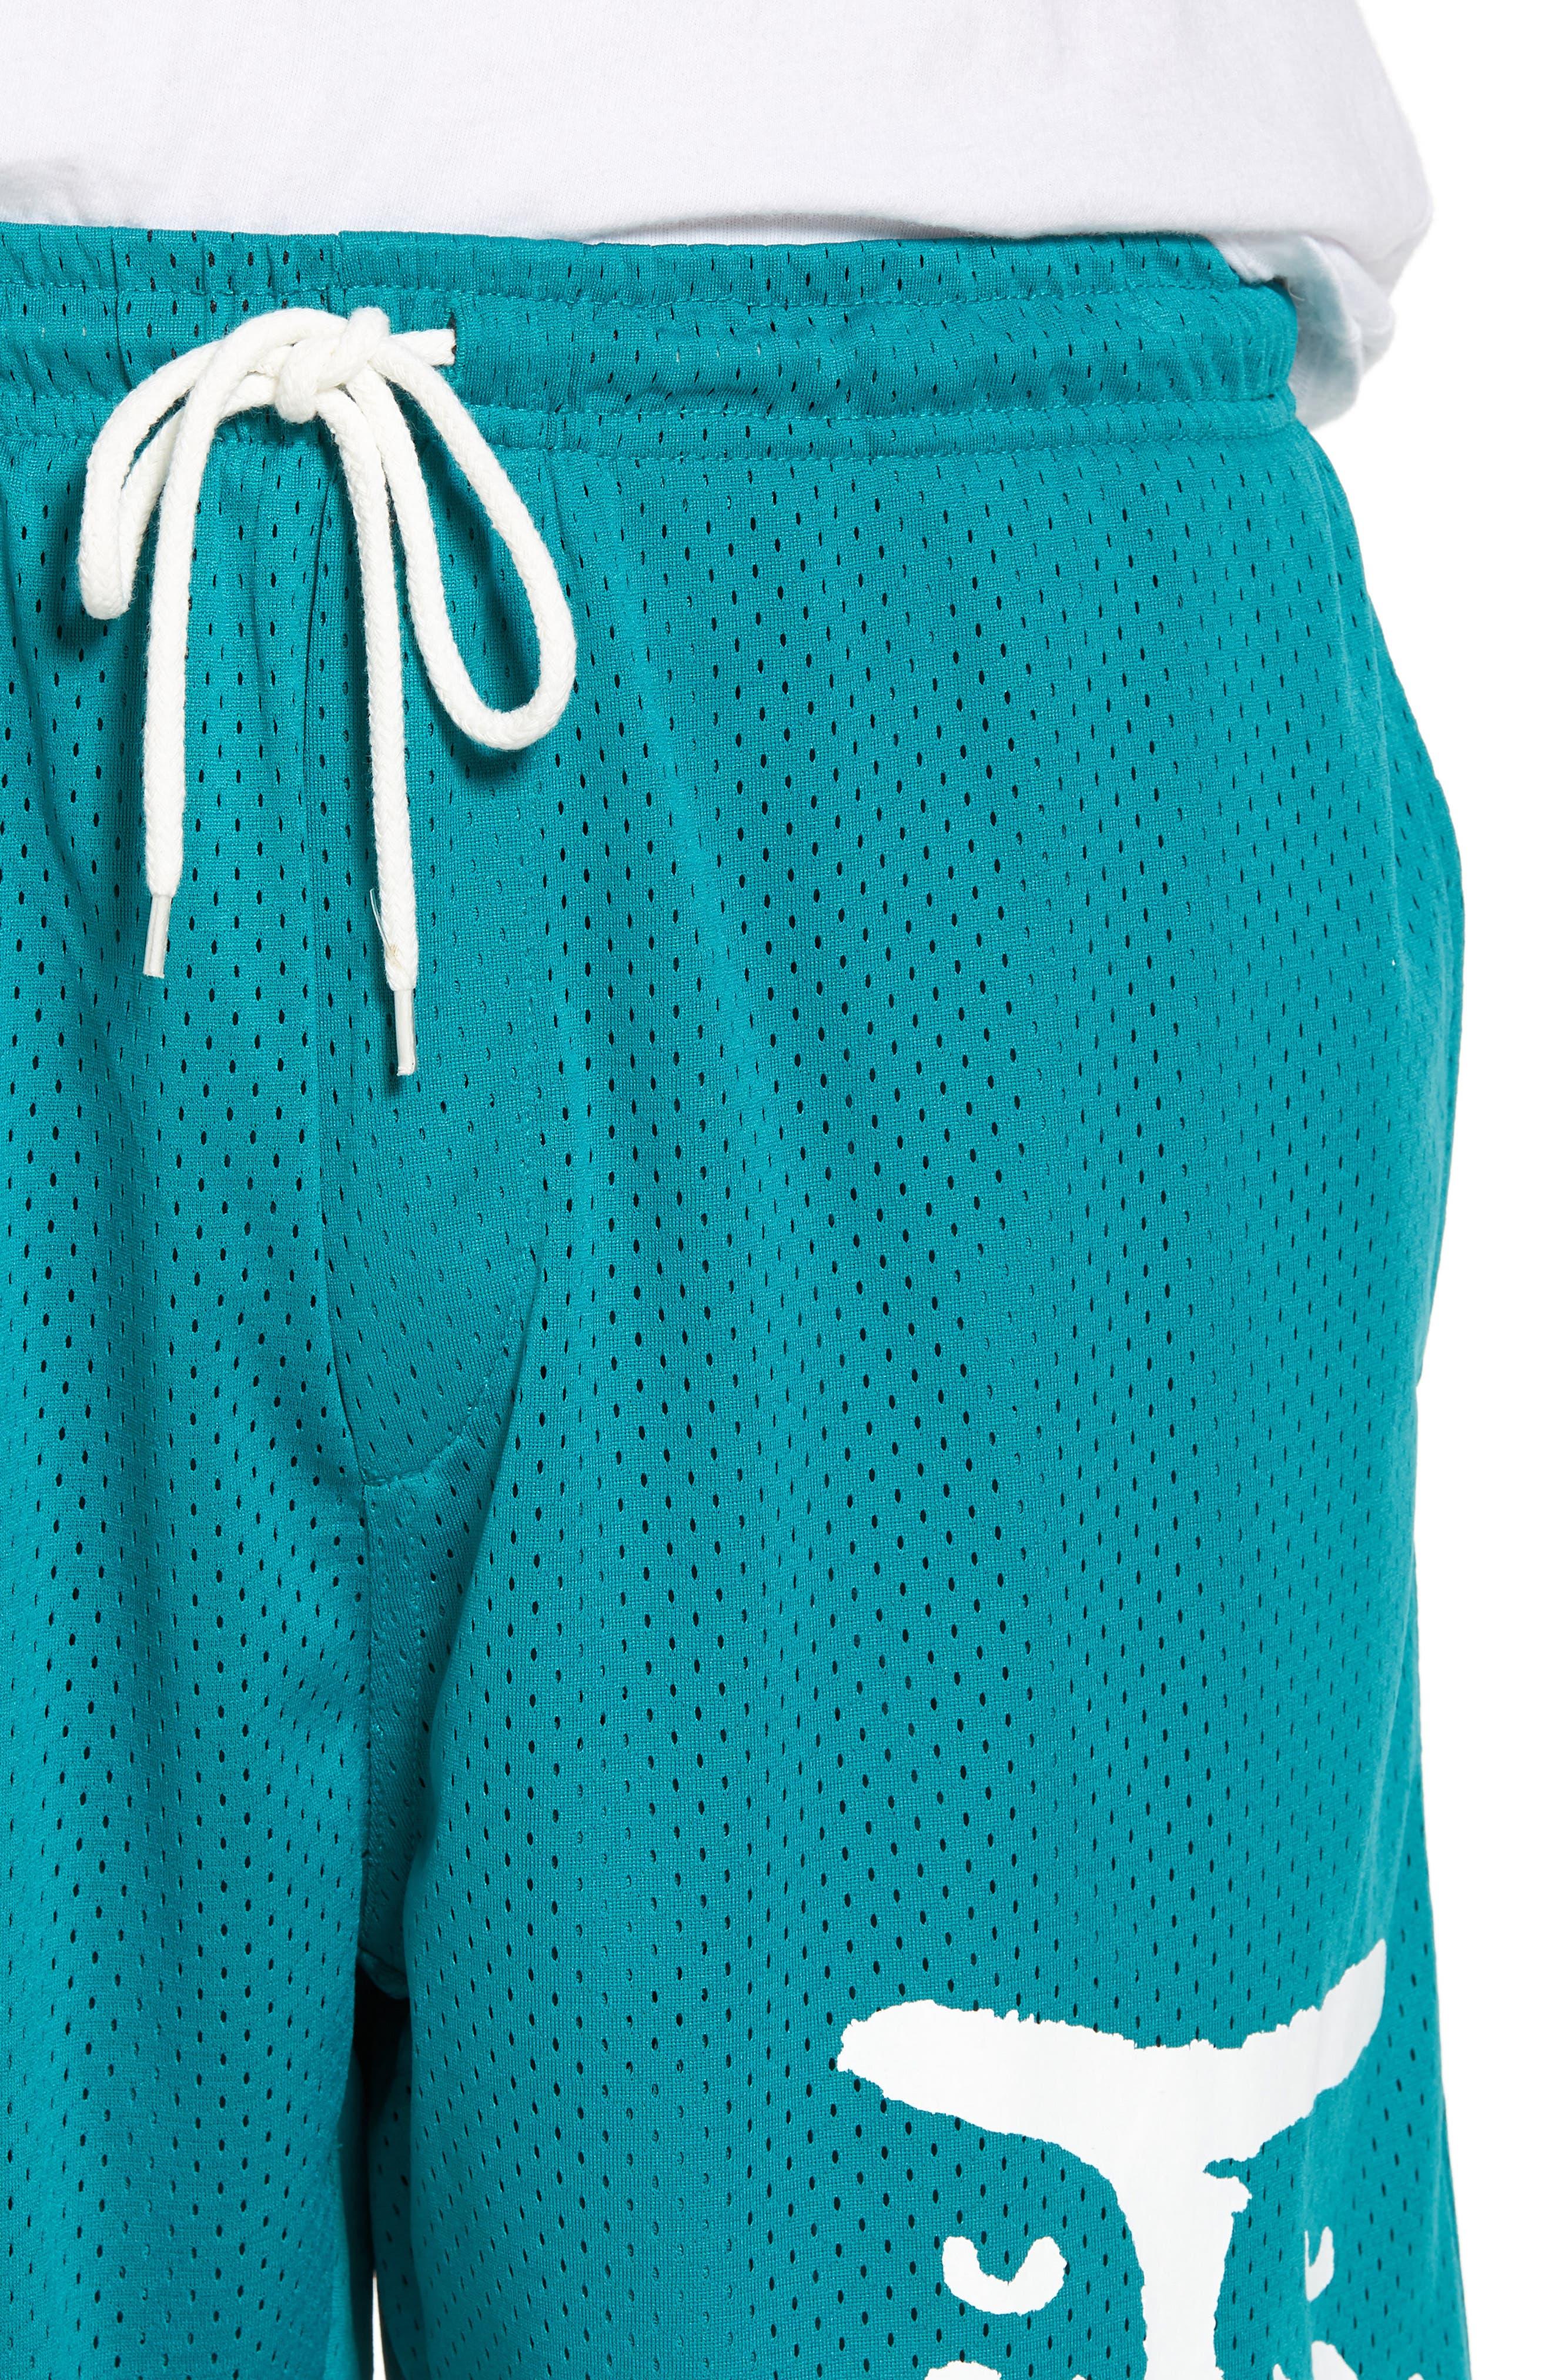 O.P.E. Athletic Shorts,                             Alternate thumbnail 4, color,                             Teal